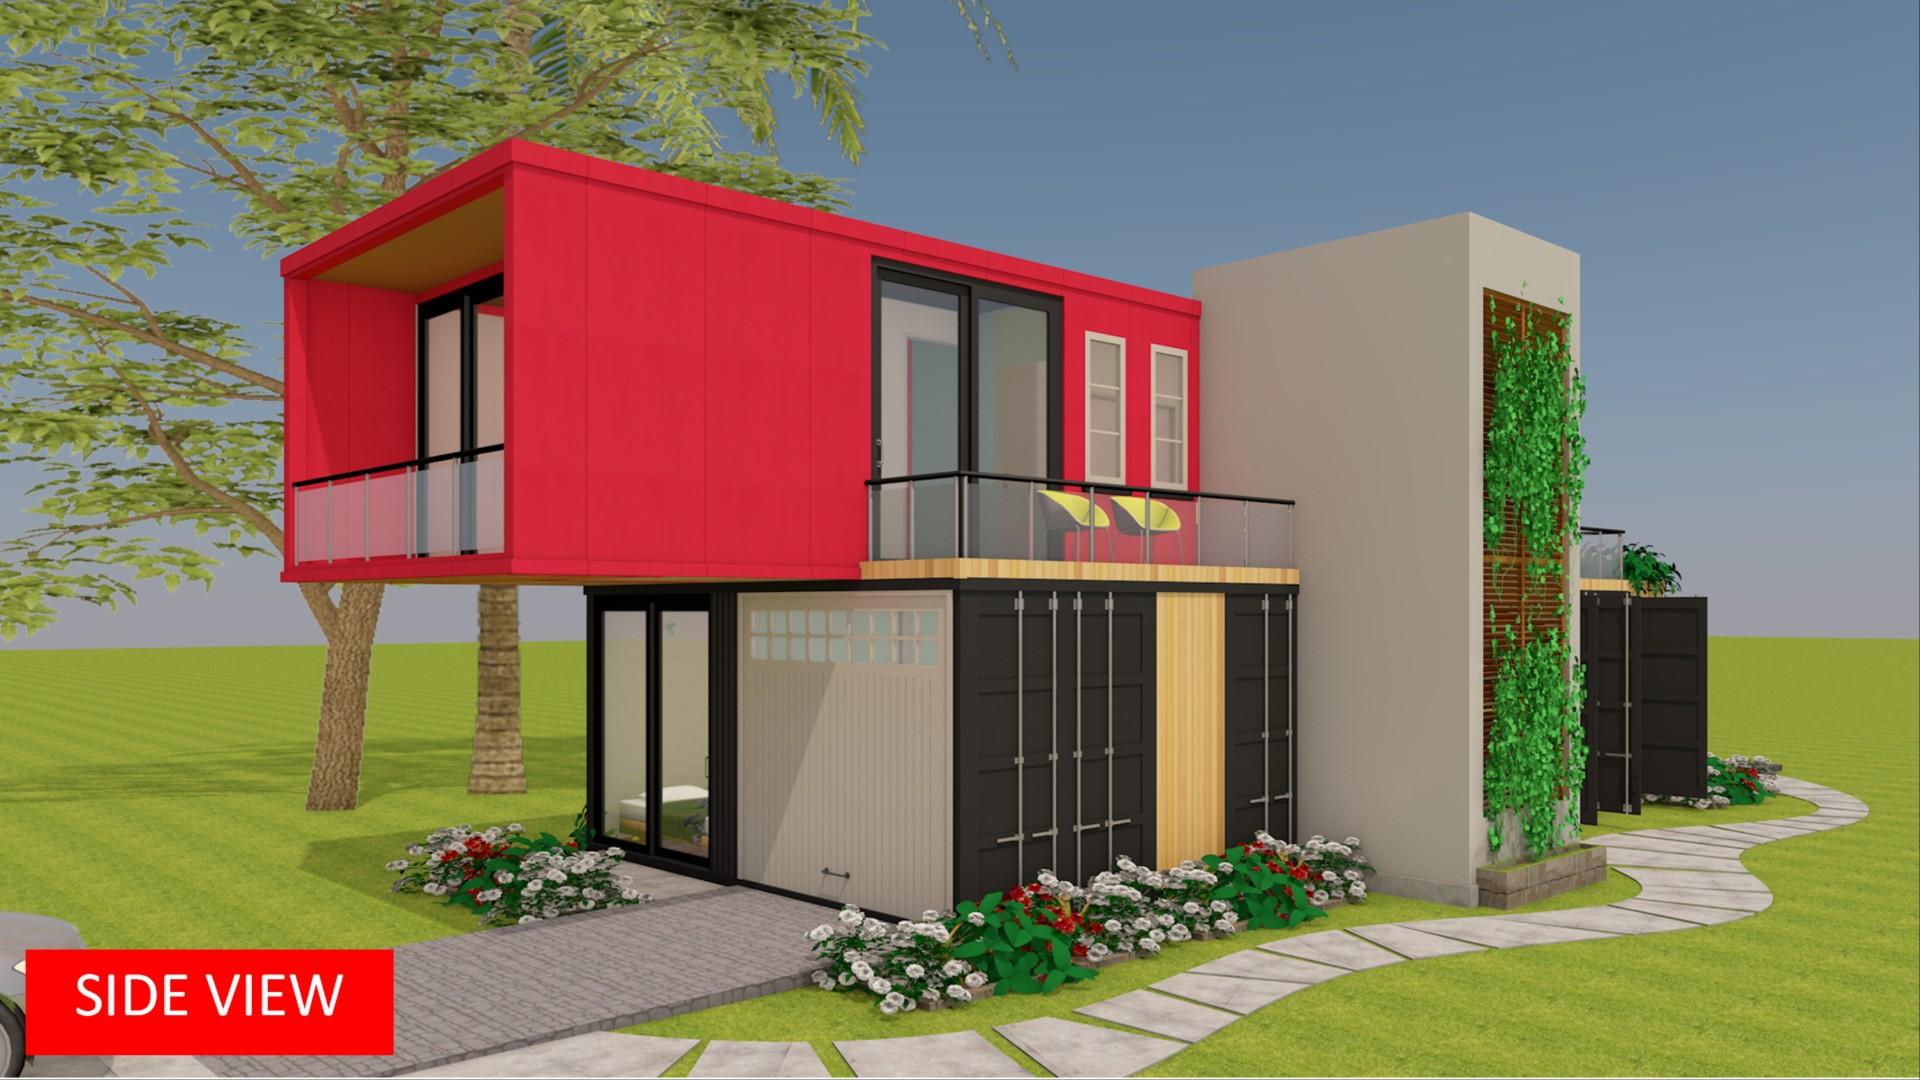 Modular Shipping Container Prefab Design + Floor Plans | MODBOX 1300